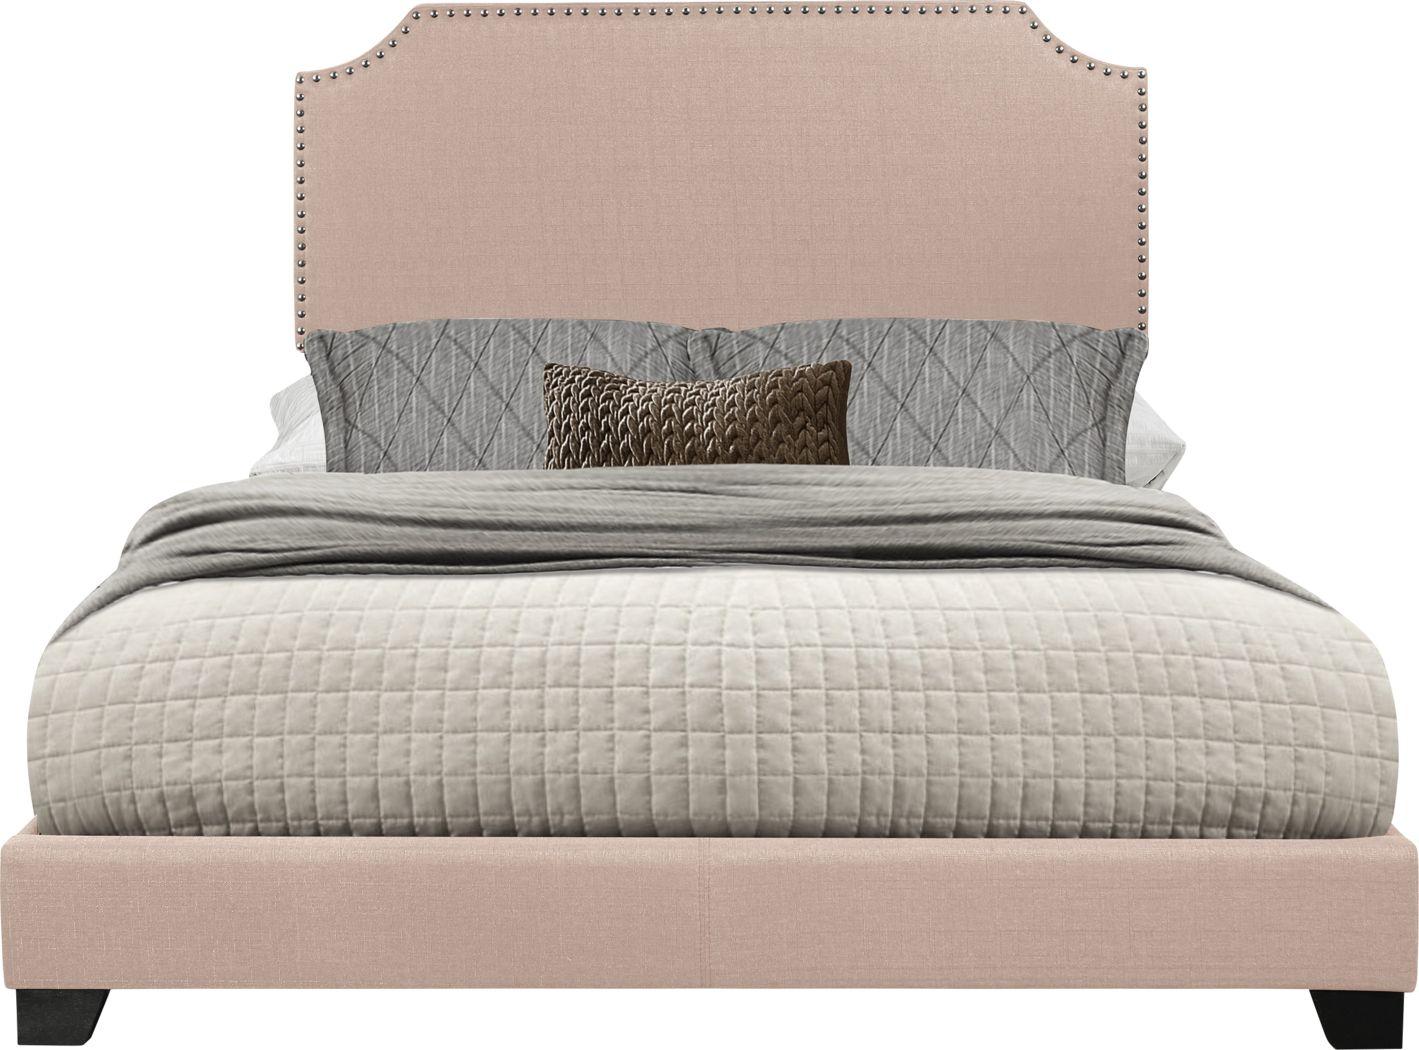 Carshalton Beige Queen Upholstered Bed